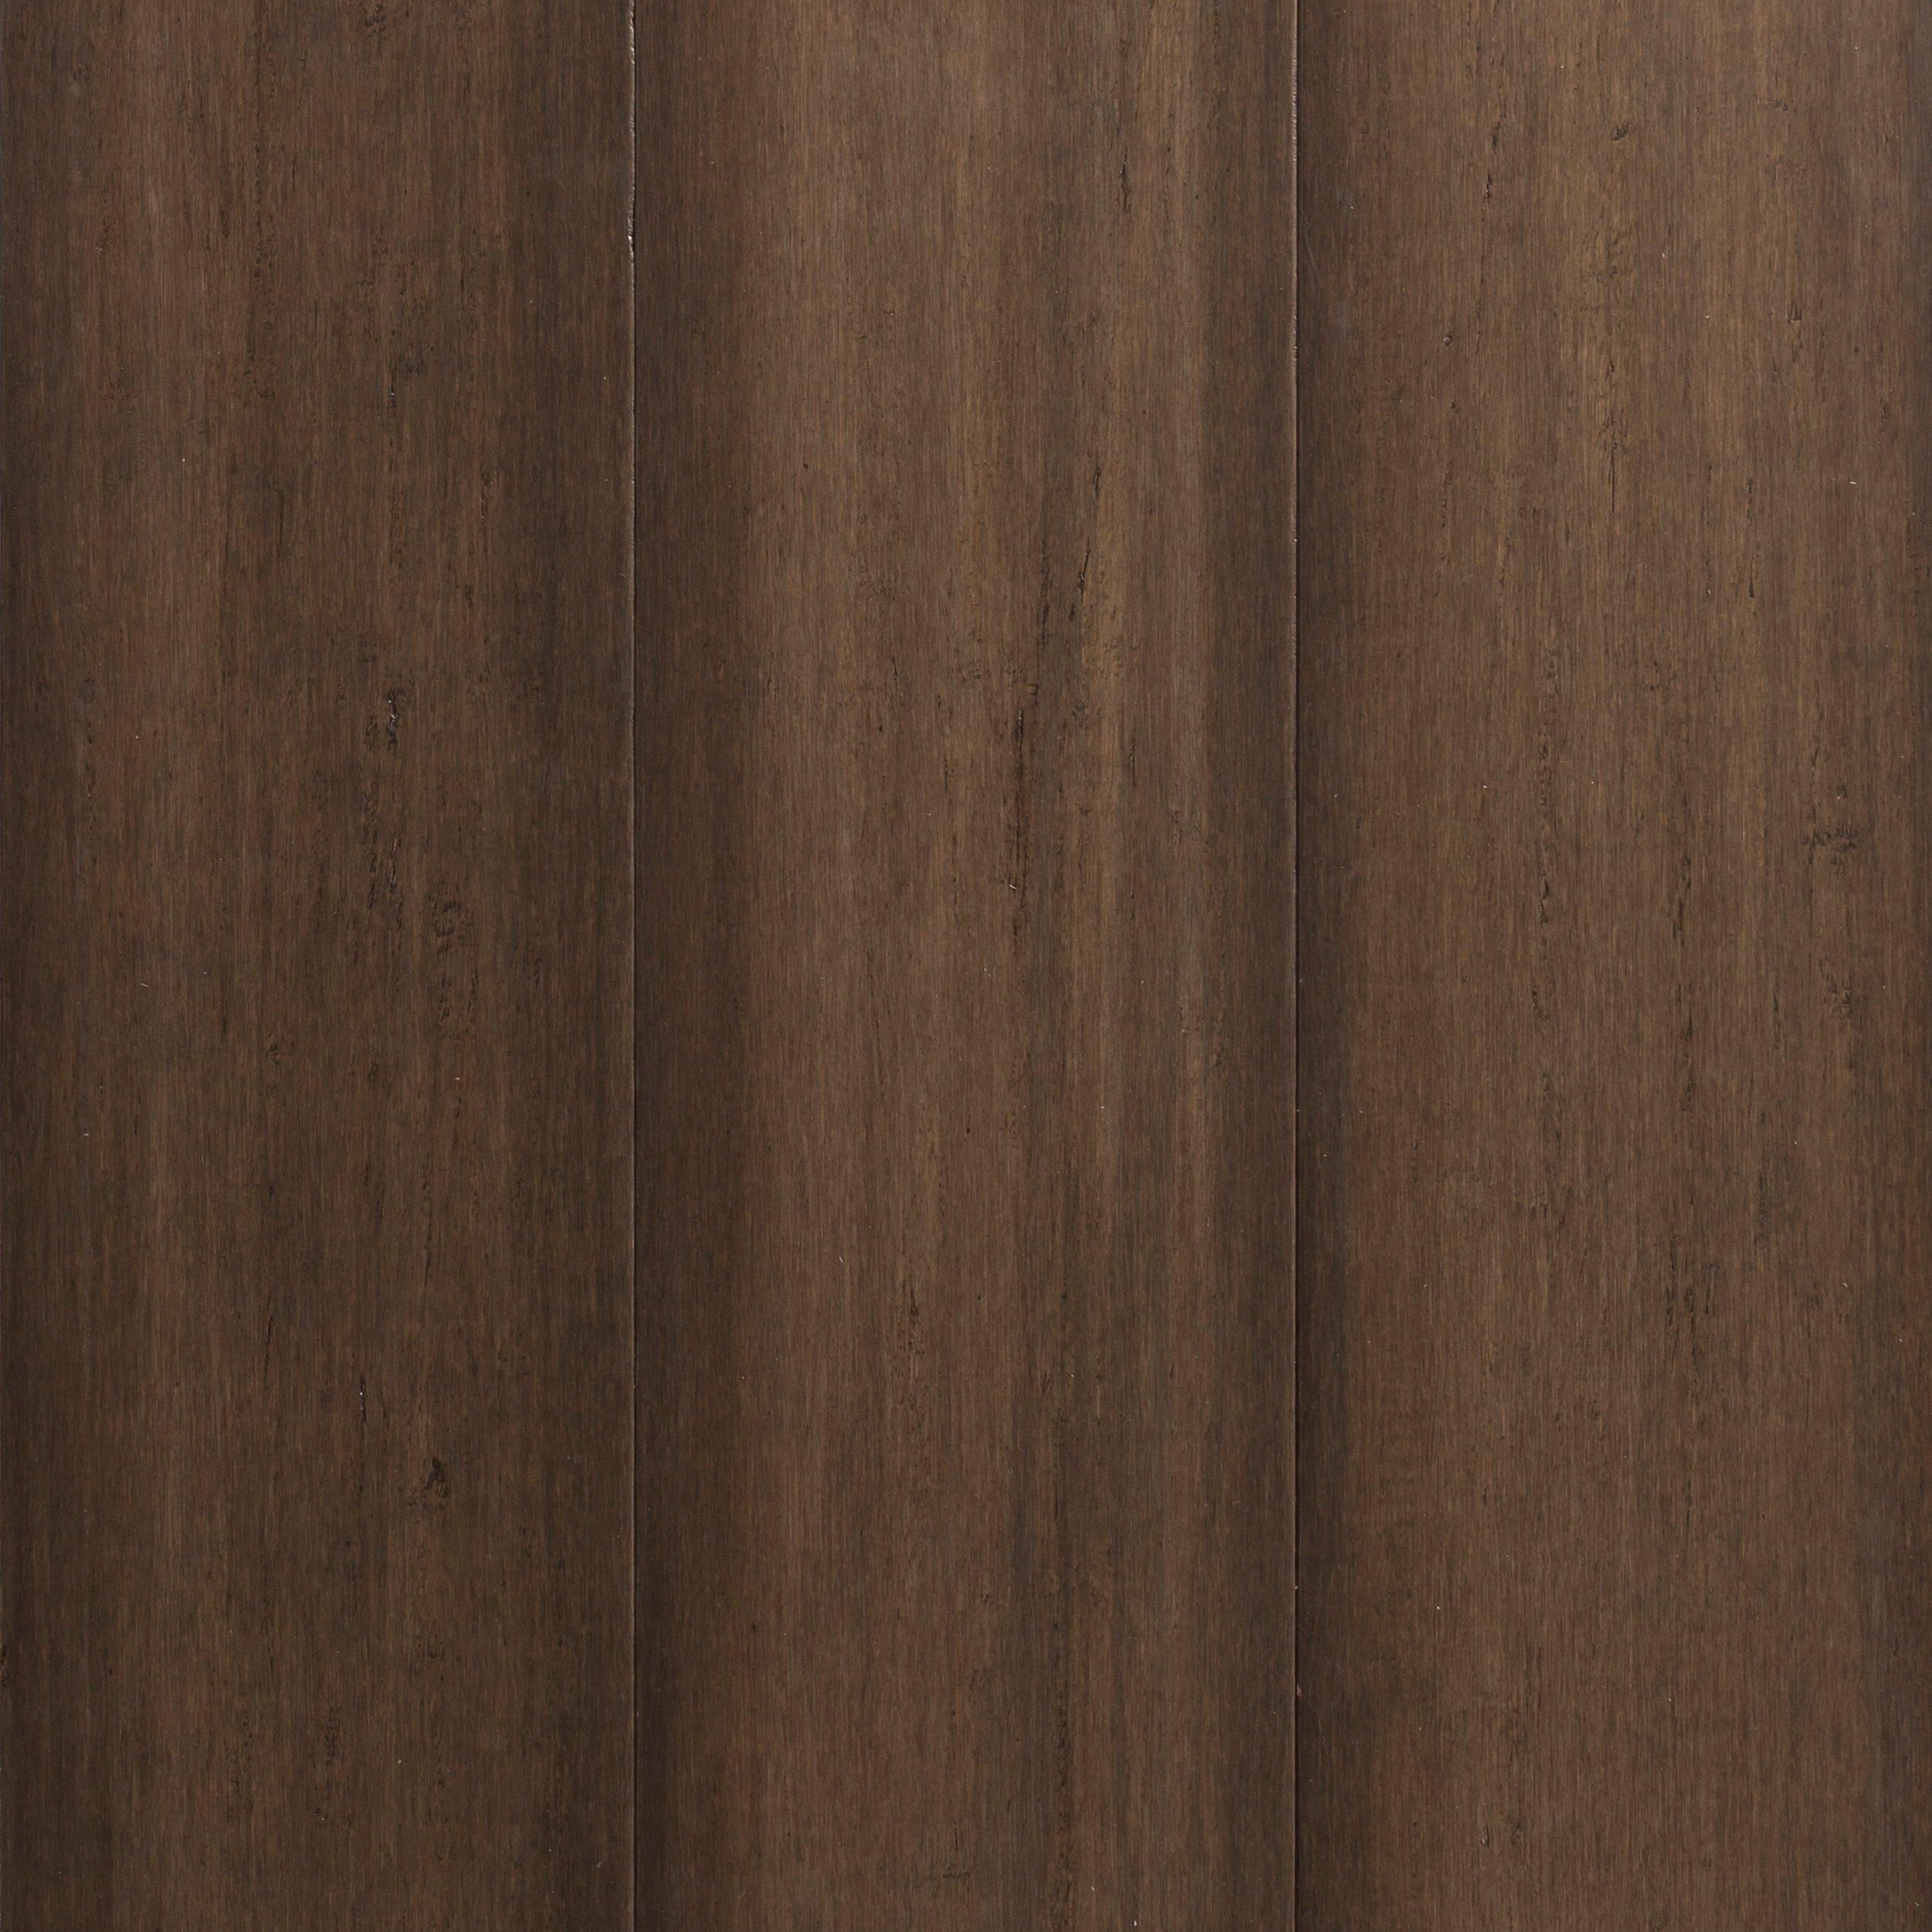 Greige Hand Scraped Locking Engineered Stranded Bamboo Flooring